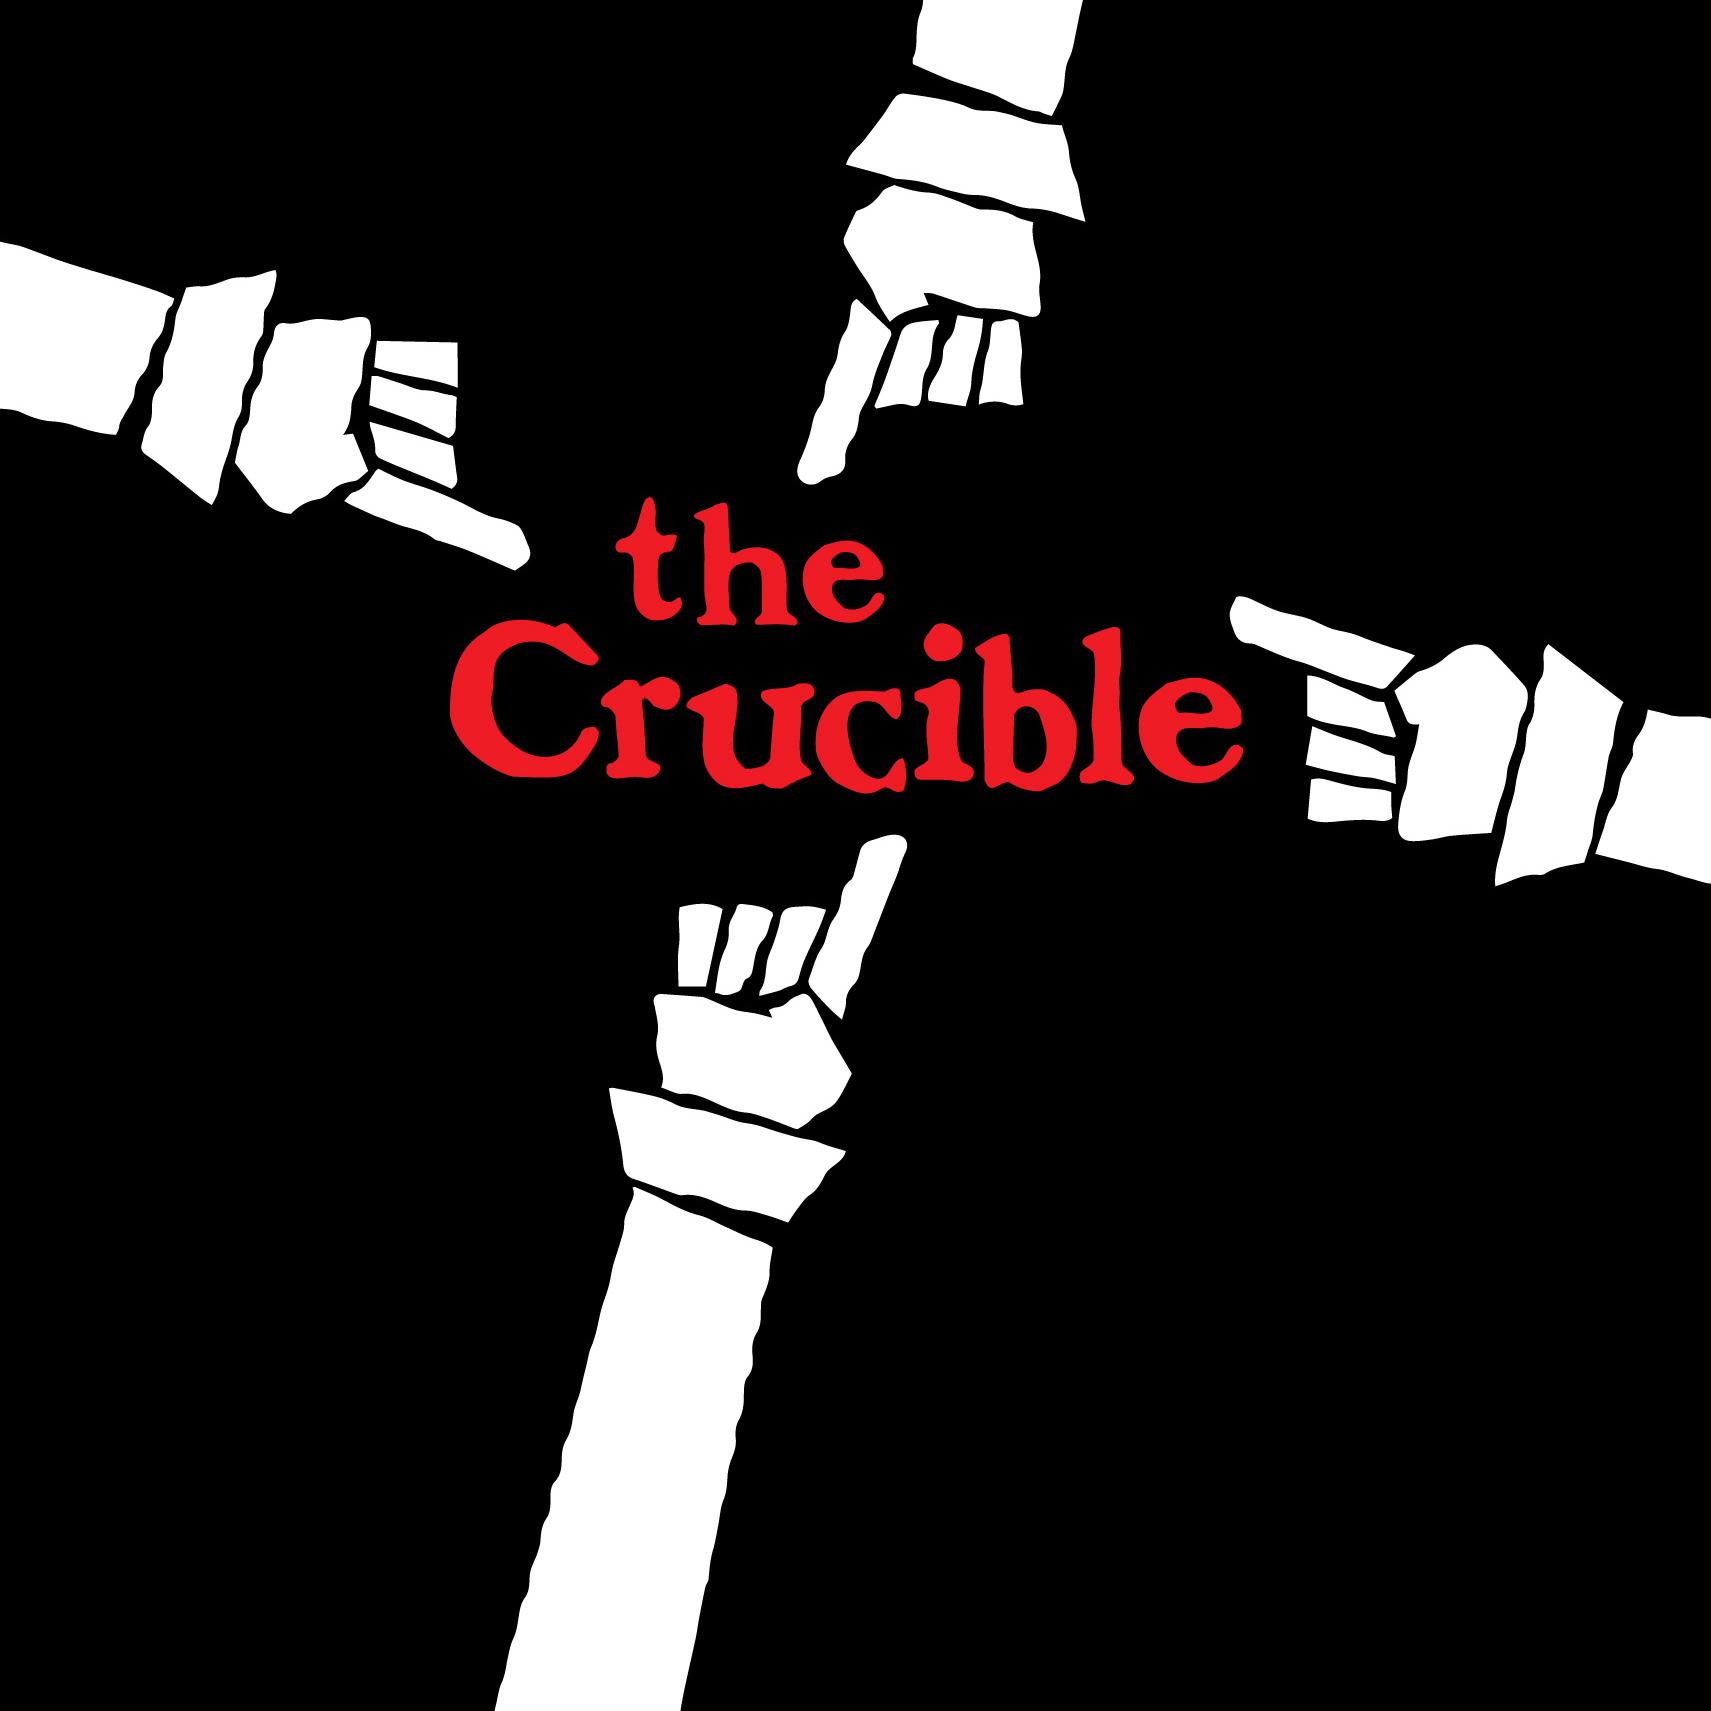 Arthur Miller's The Crucible 2019